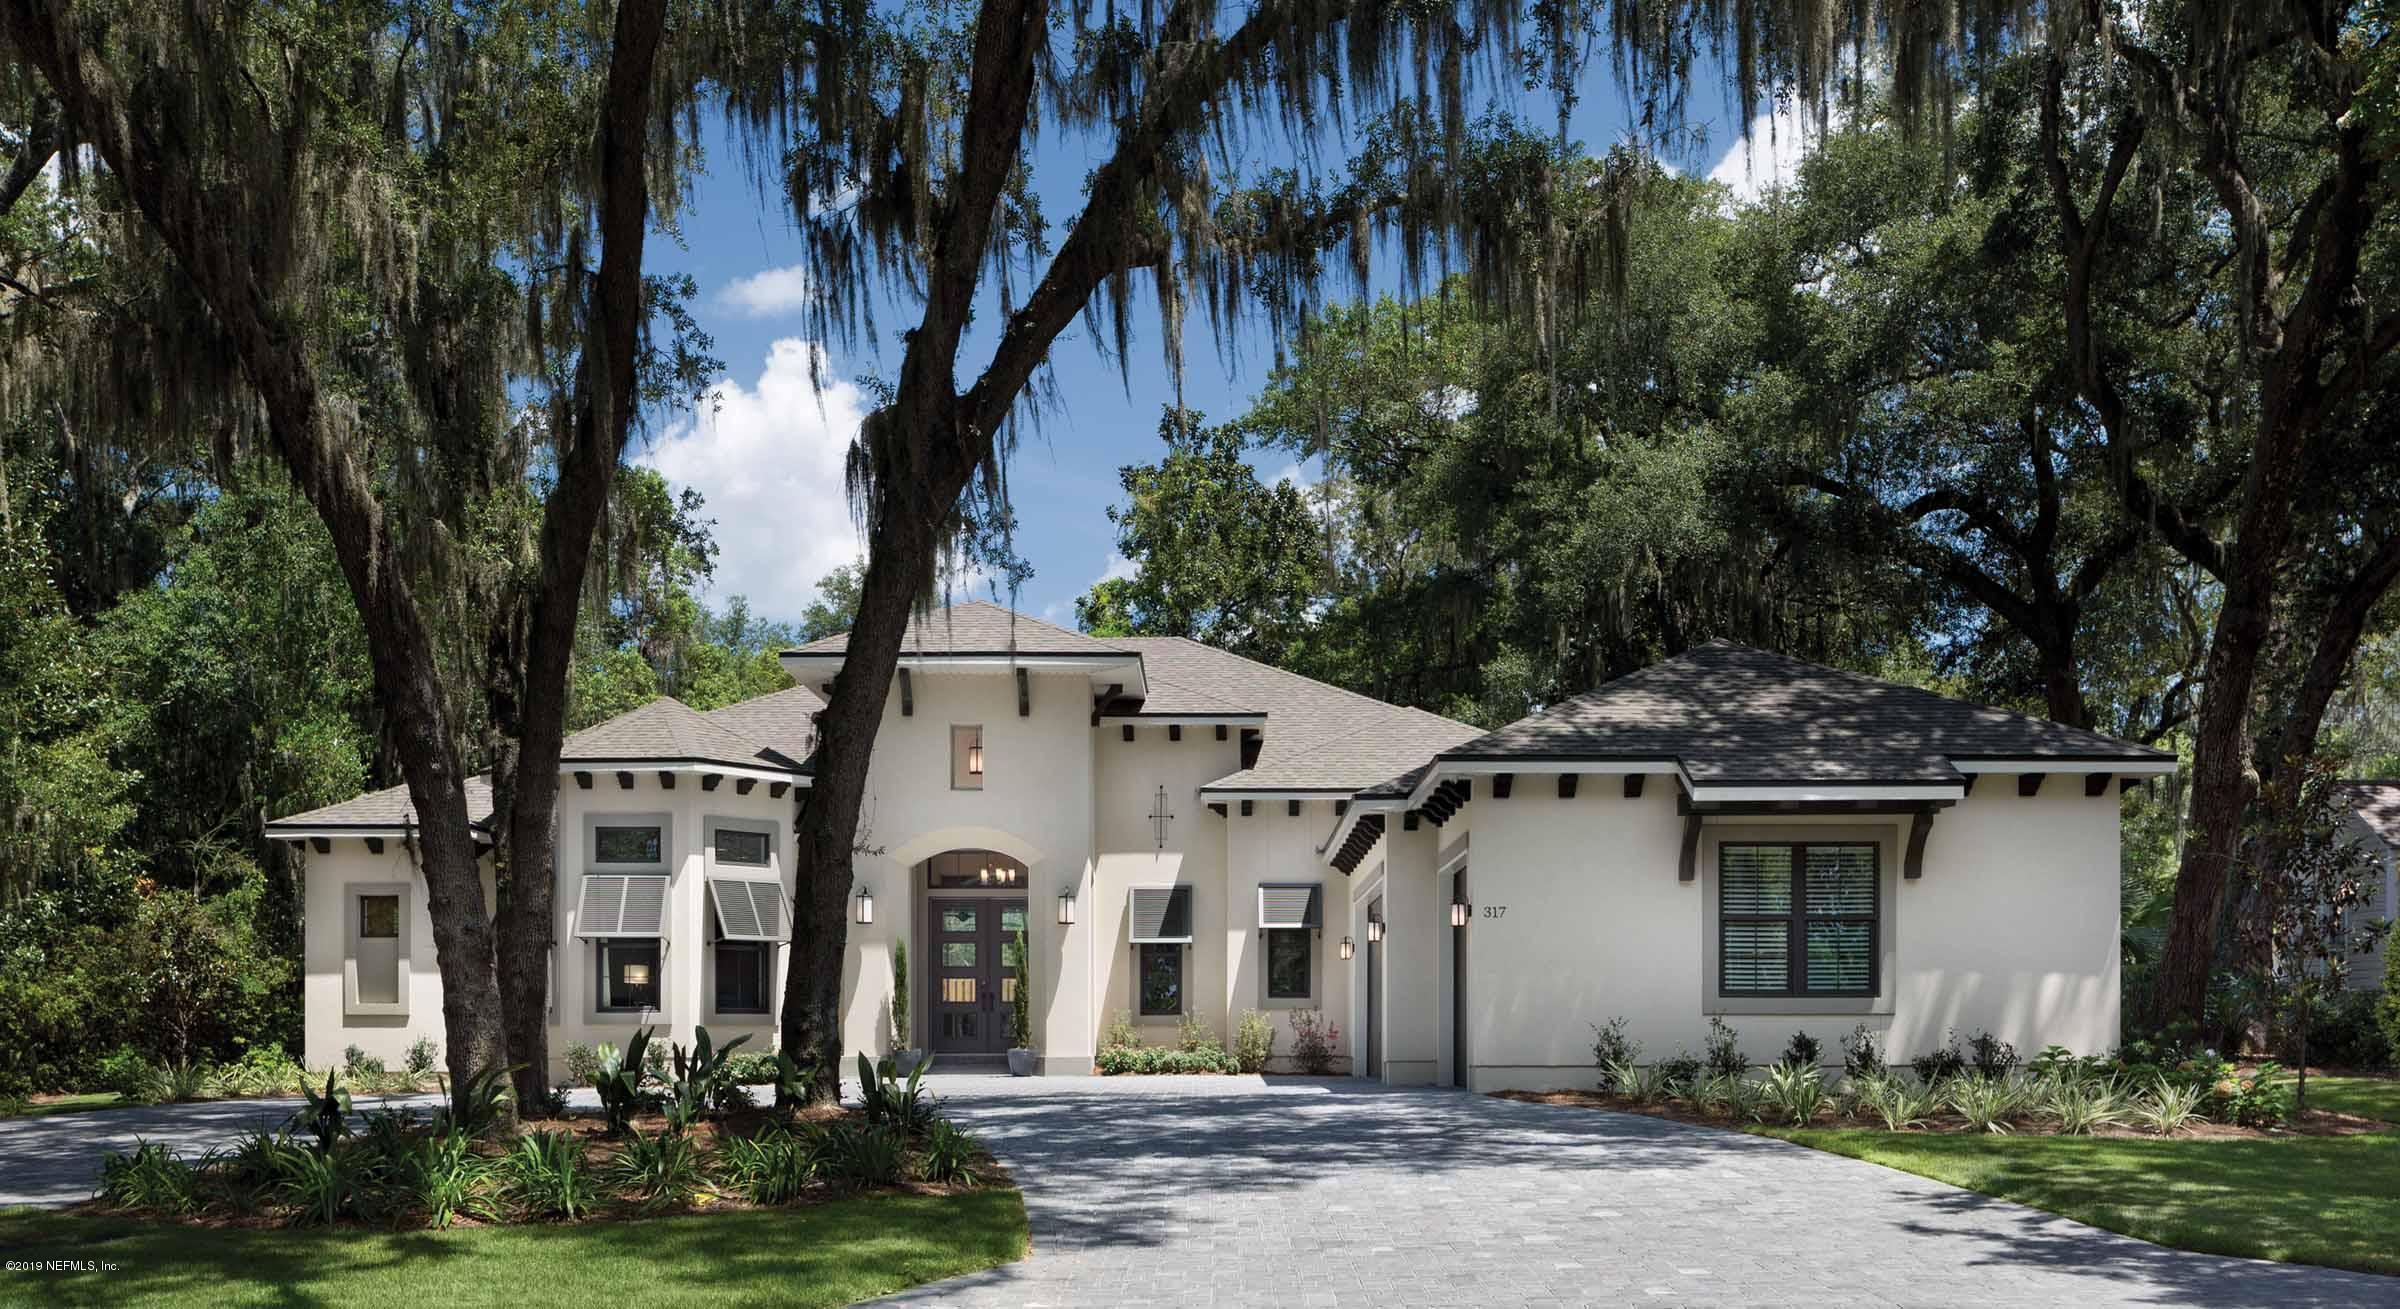 55A SAN CRISTOBAL, ST AUGUSTINE, FLORIDA 32095, 3 Bedrooms Bedrooms, ,3 BathroomsBathrooms,Residential - single family,For sale,SAN CRISTOBAL,996417